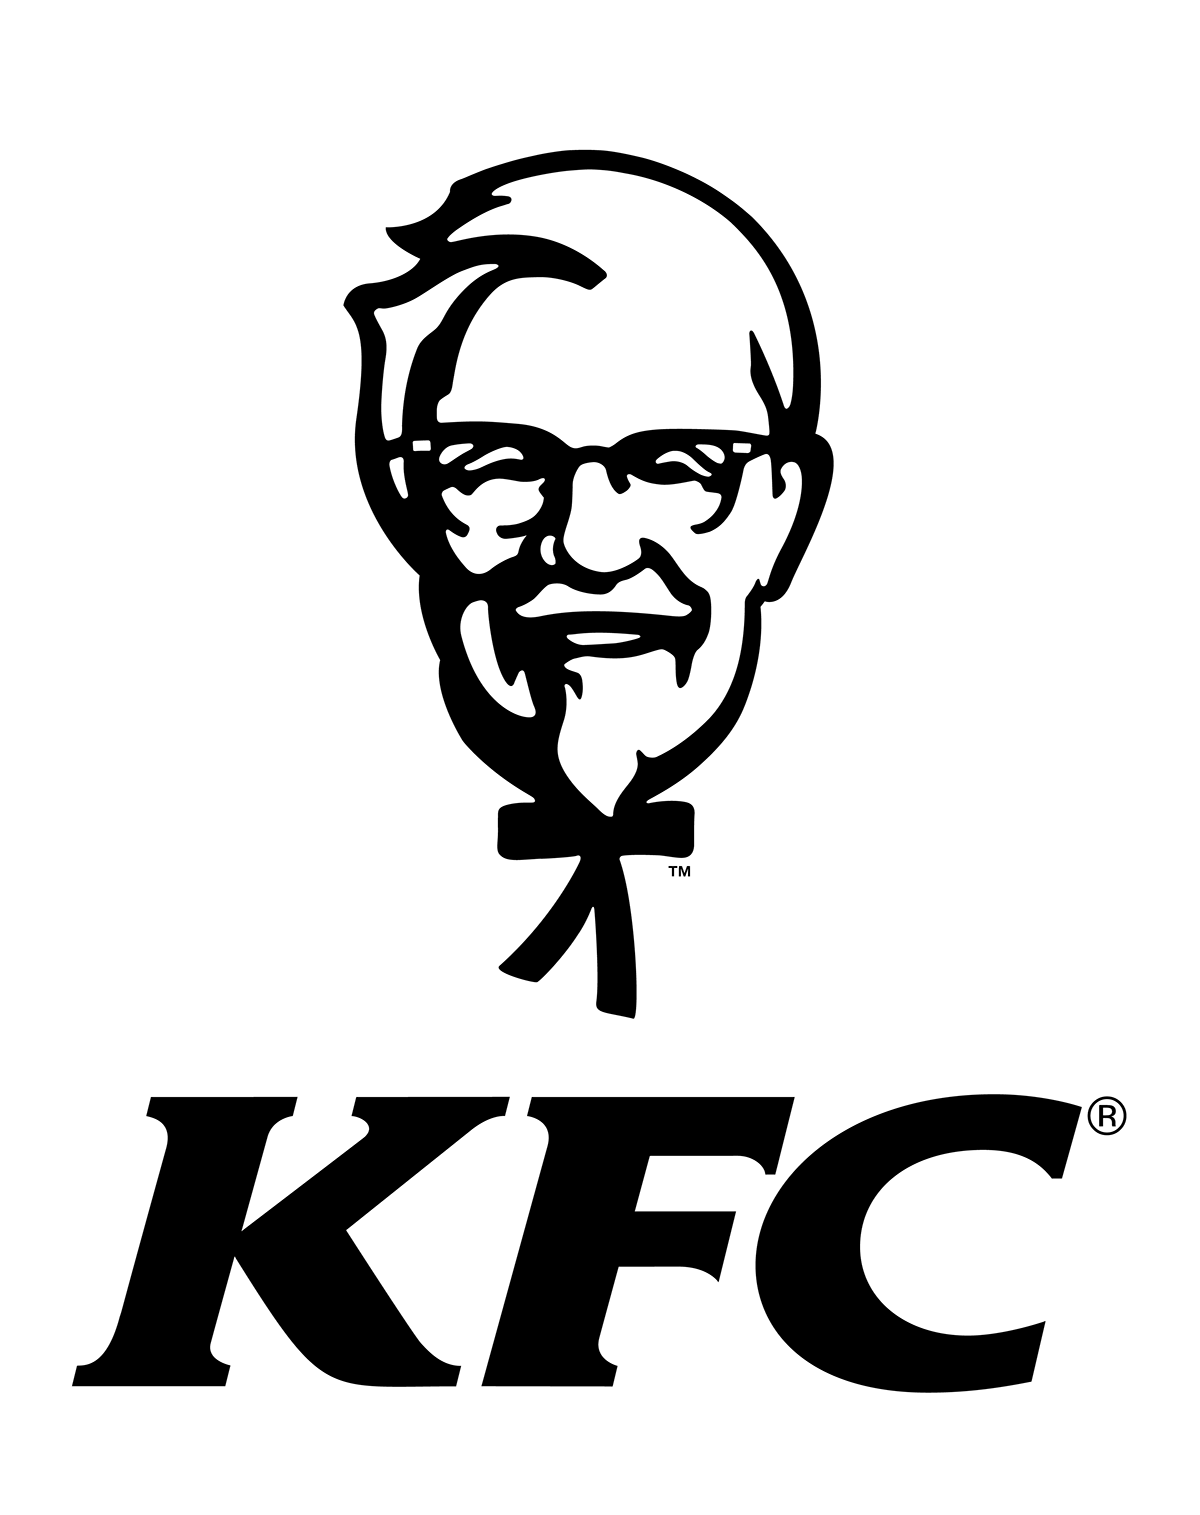 Black And Kfc Logo